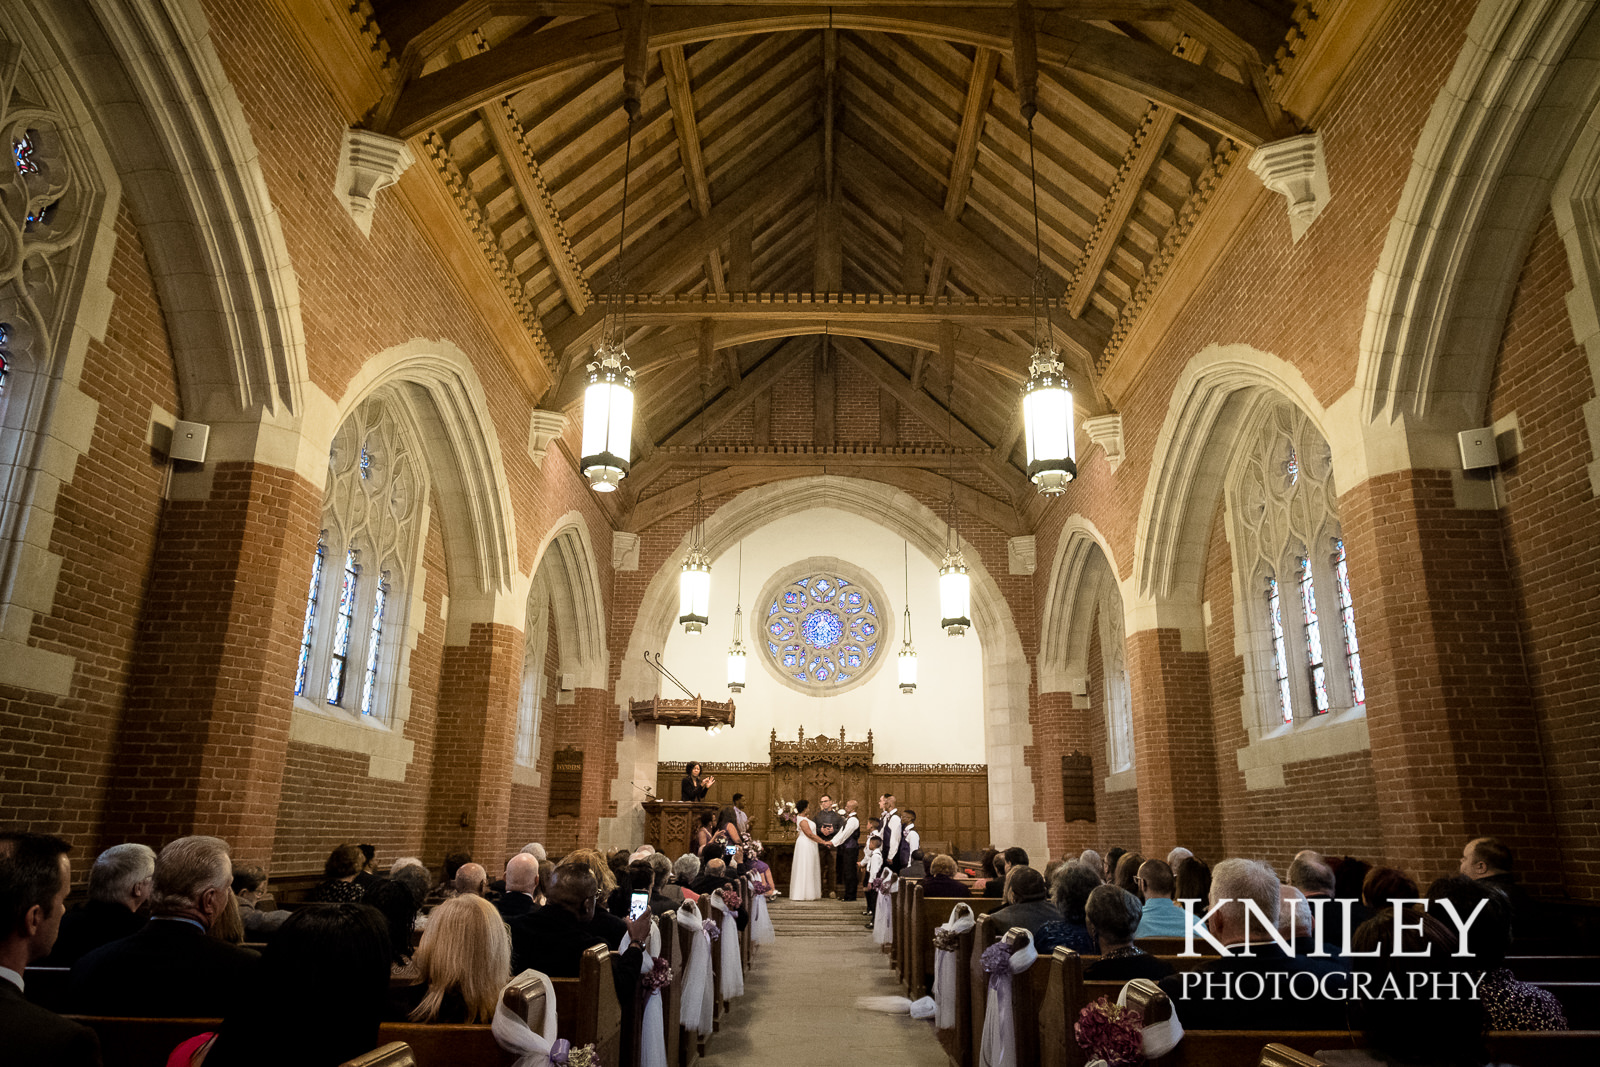 Rochester Colgate Divinity School Wedding - Classic Rochester NY Wedding - 023-XT2B4557.jpg